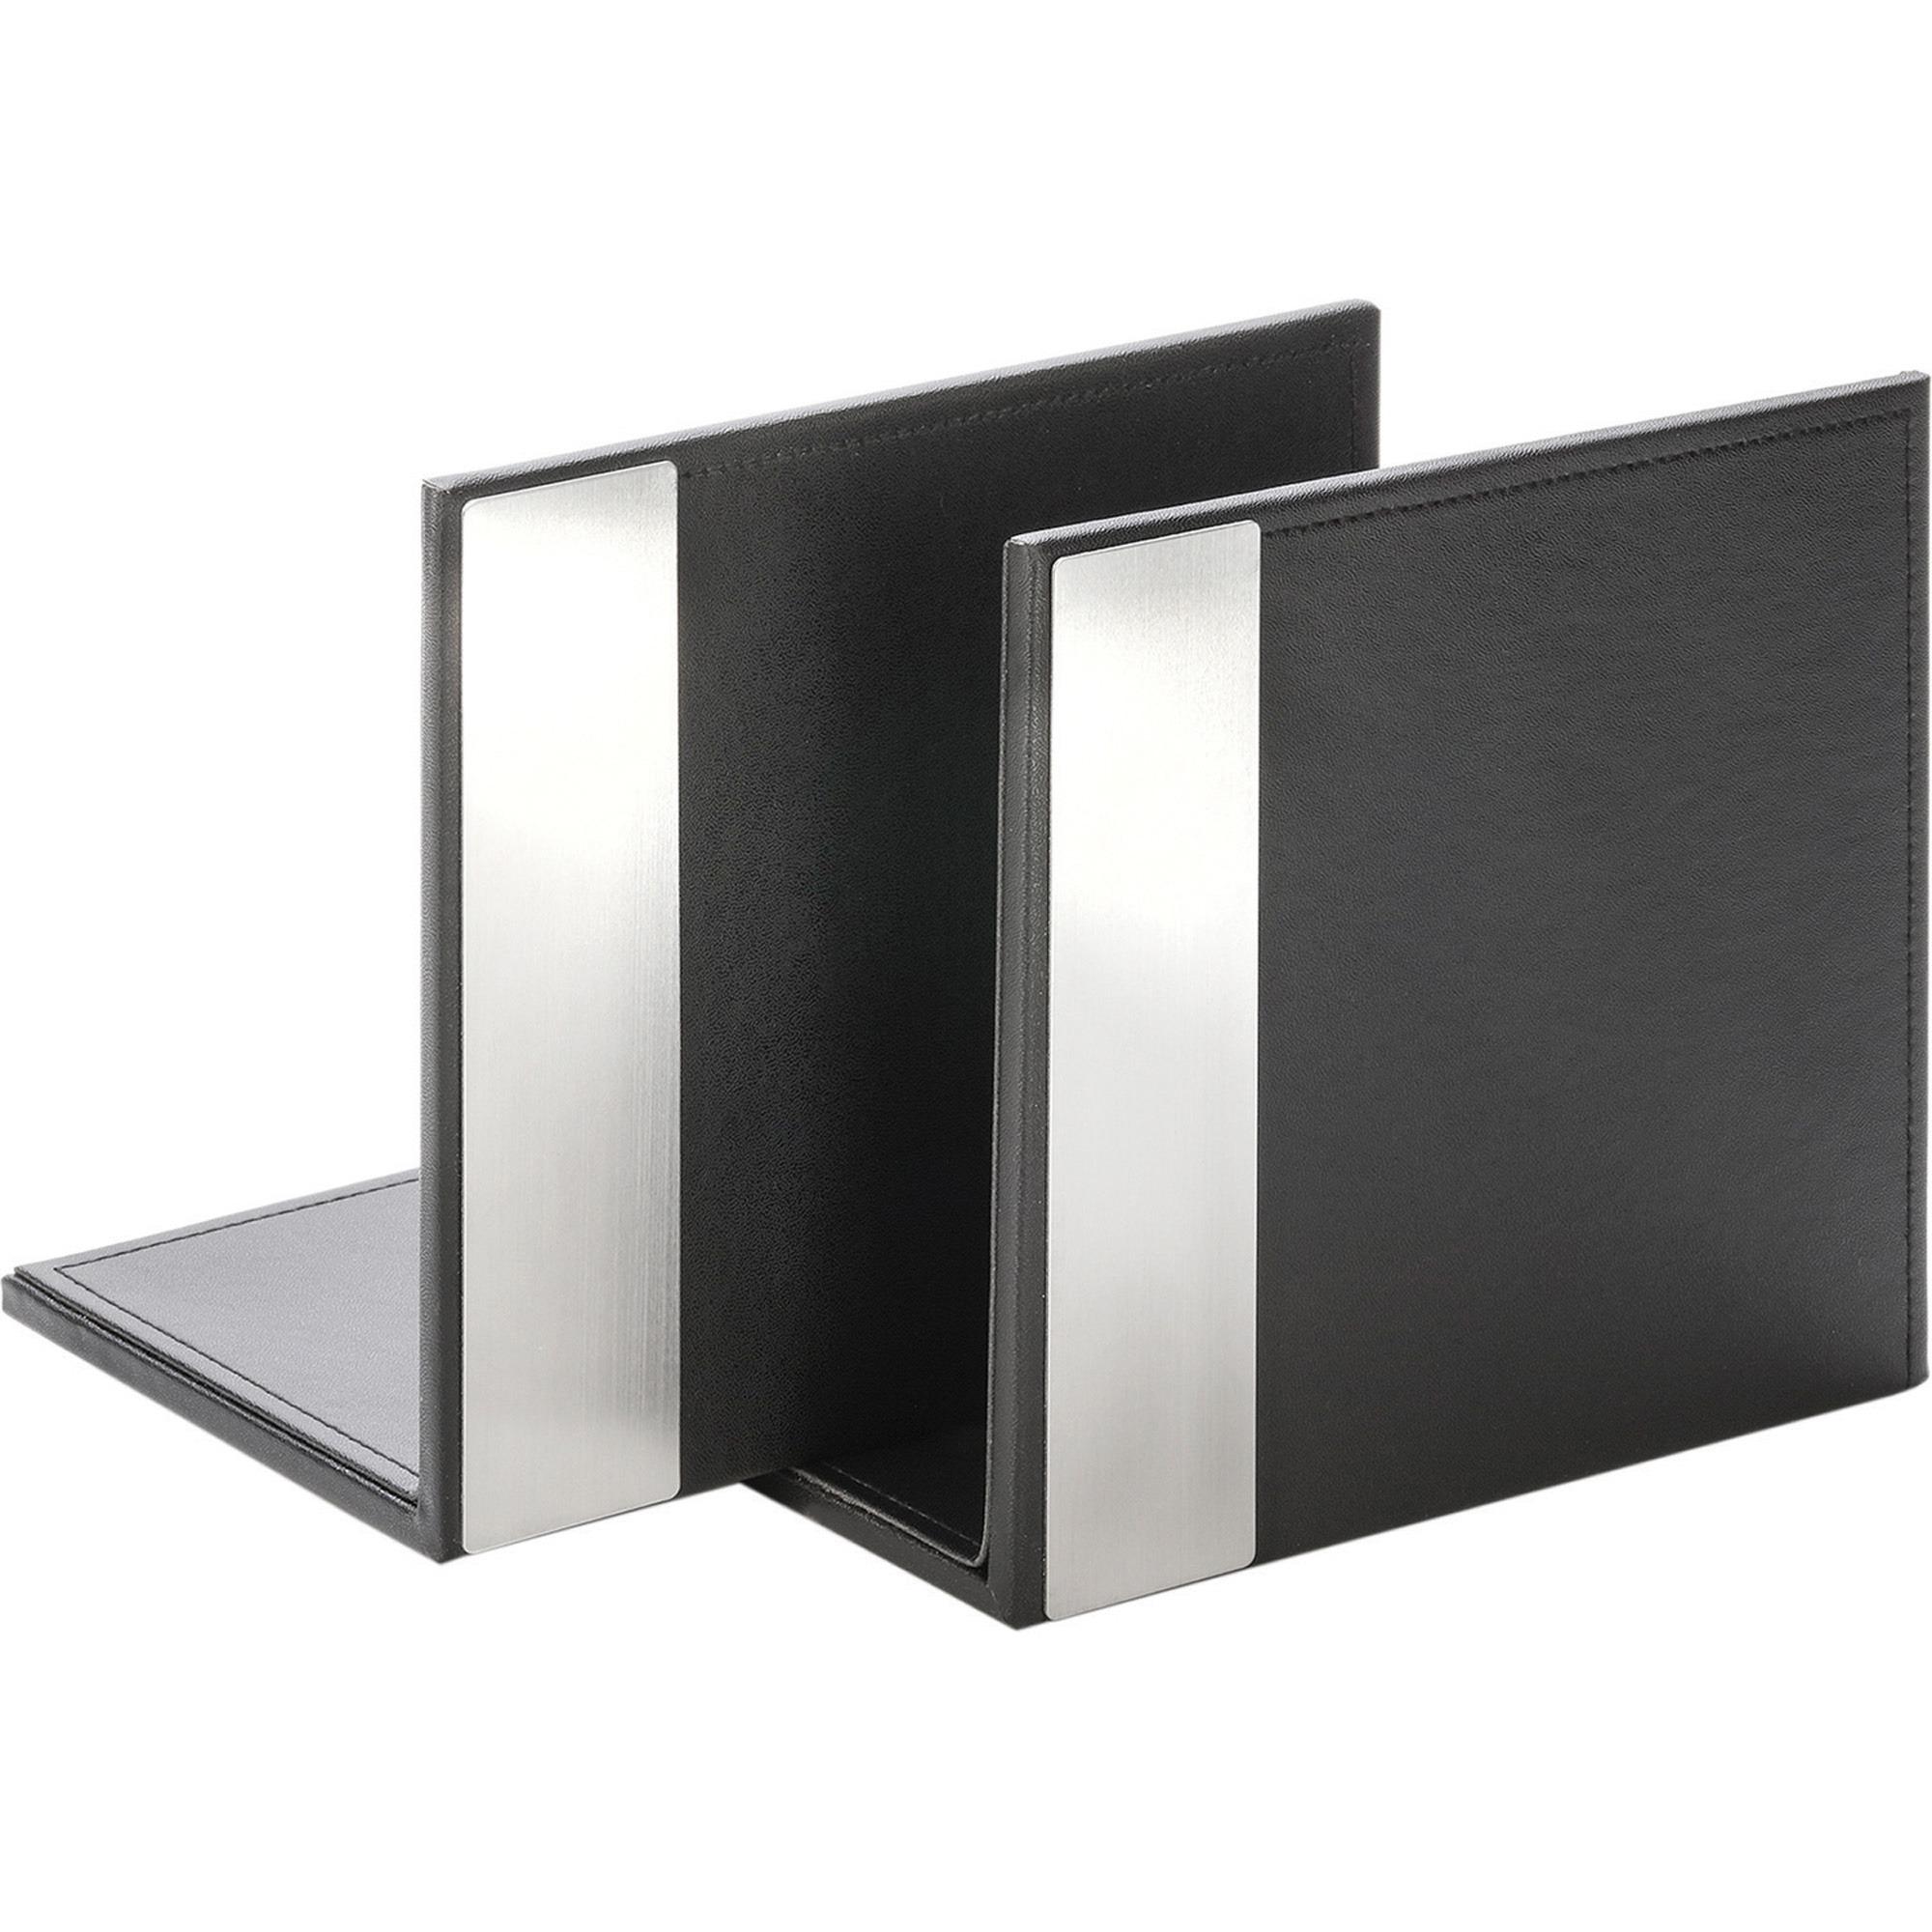 desk bureau models ca wayfair furniture table architect drafting authentic pdp